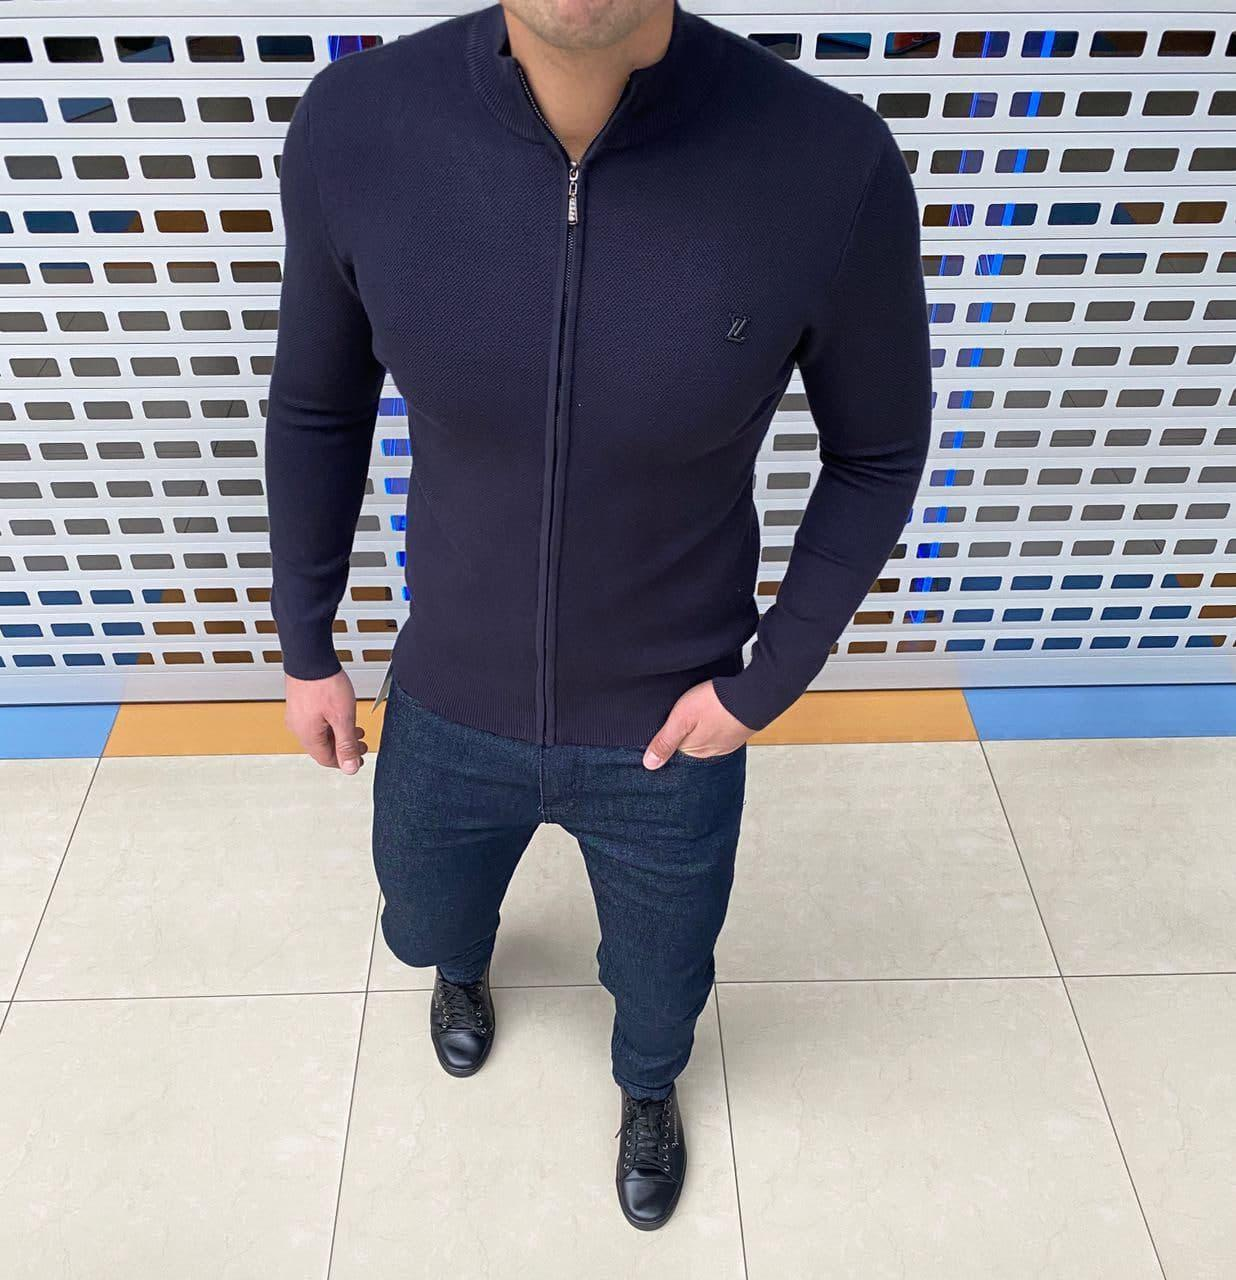 Мужская кофта на змейке Louis Vuitton H1095 синяя